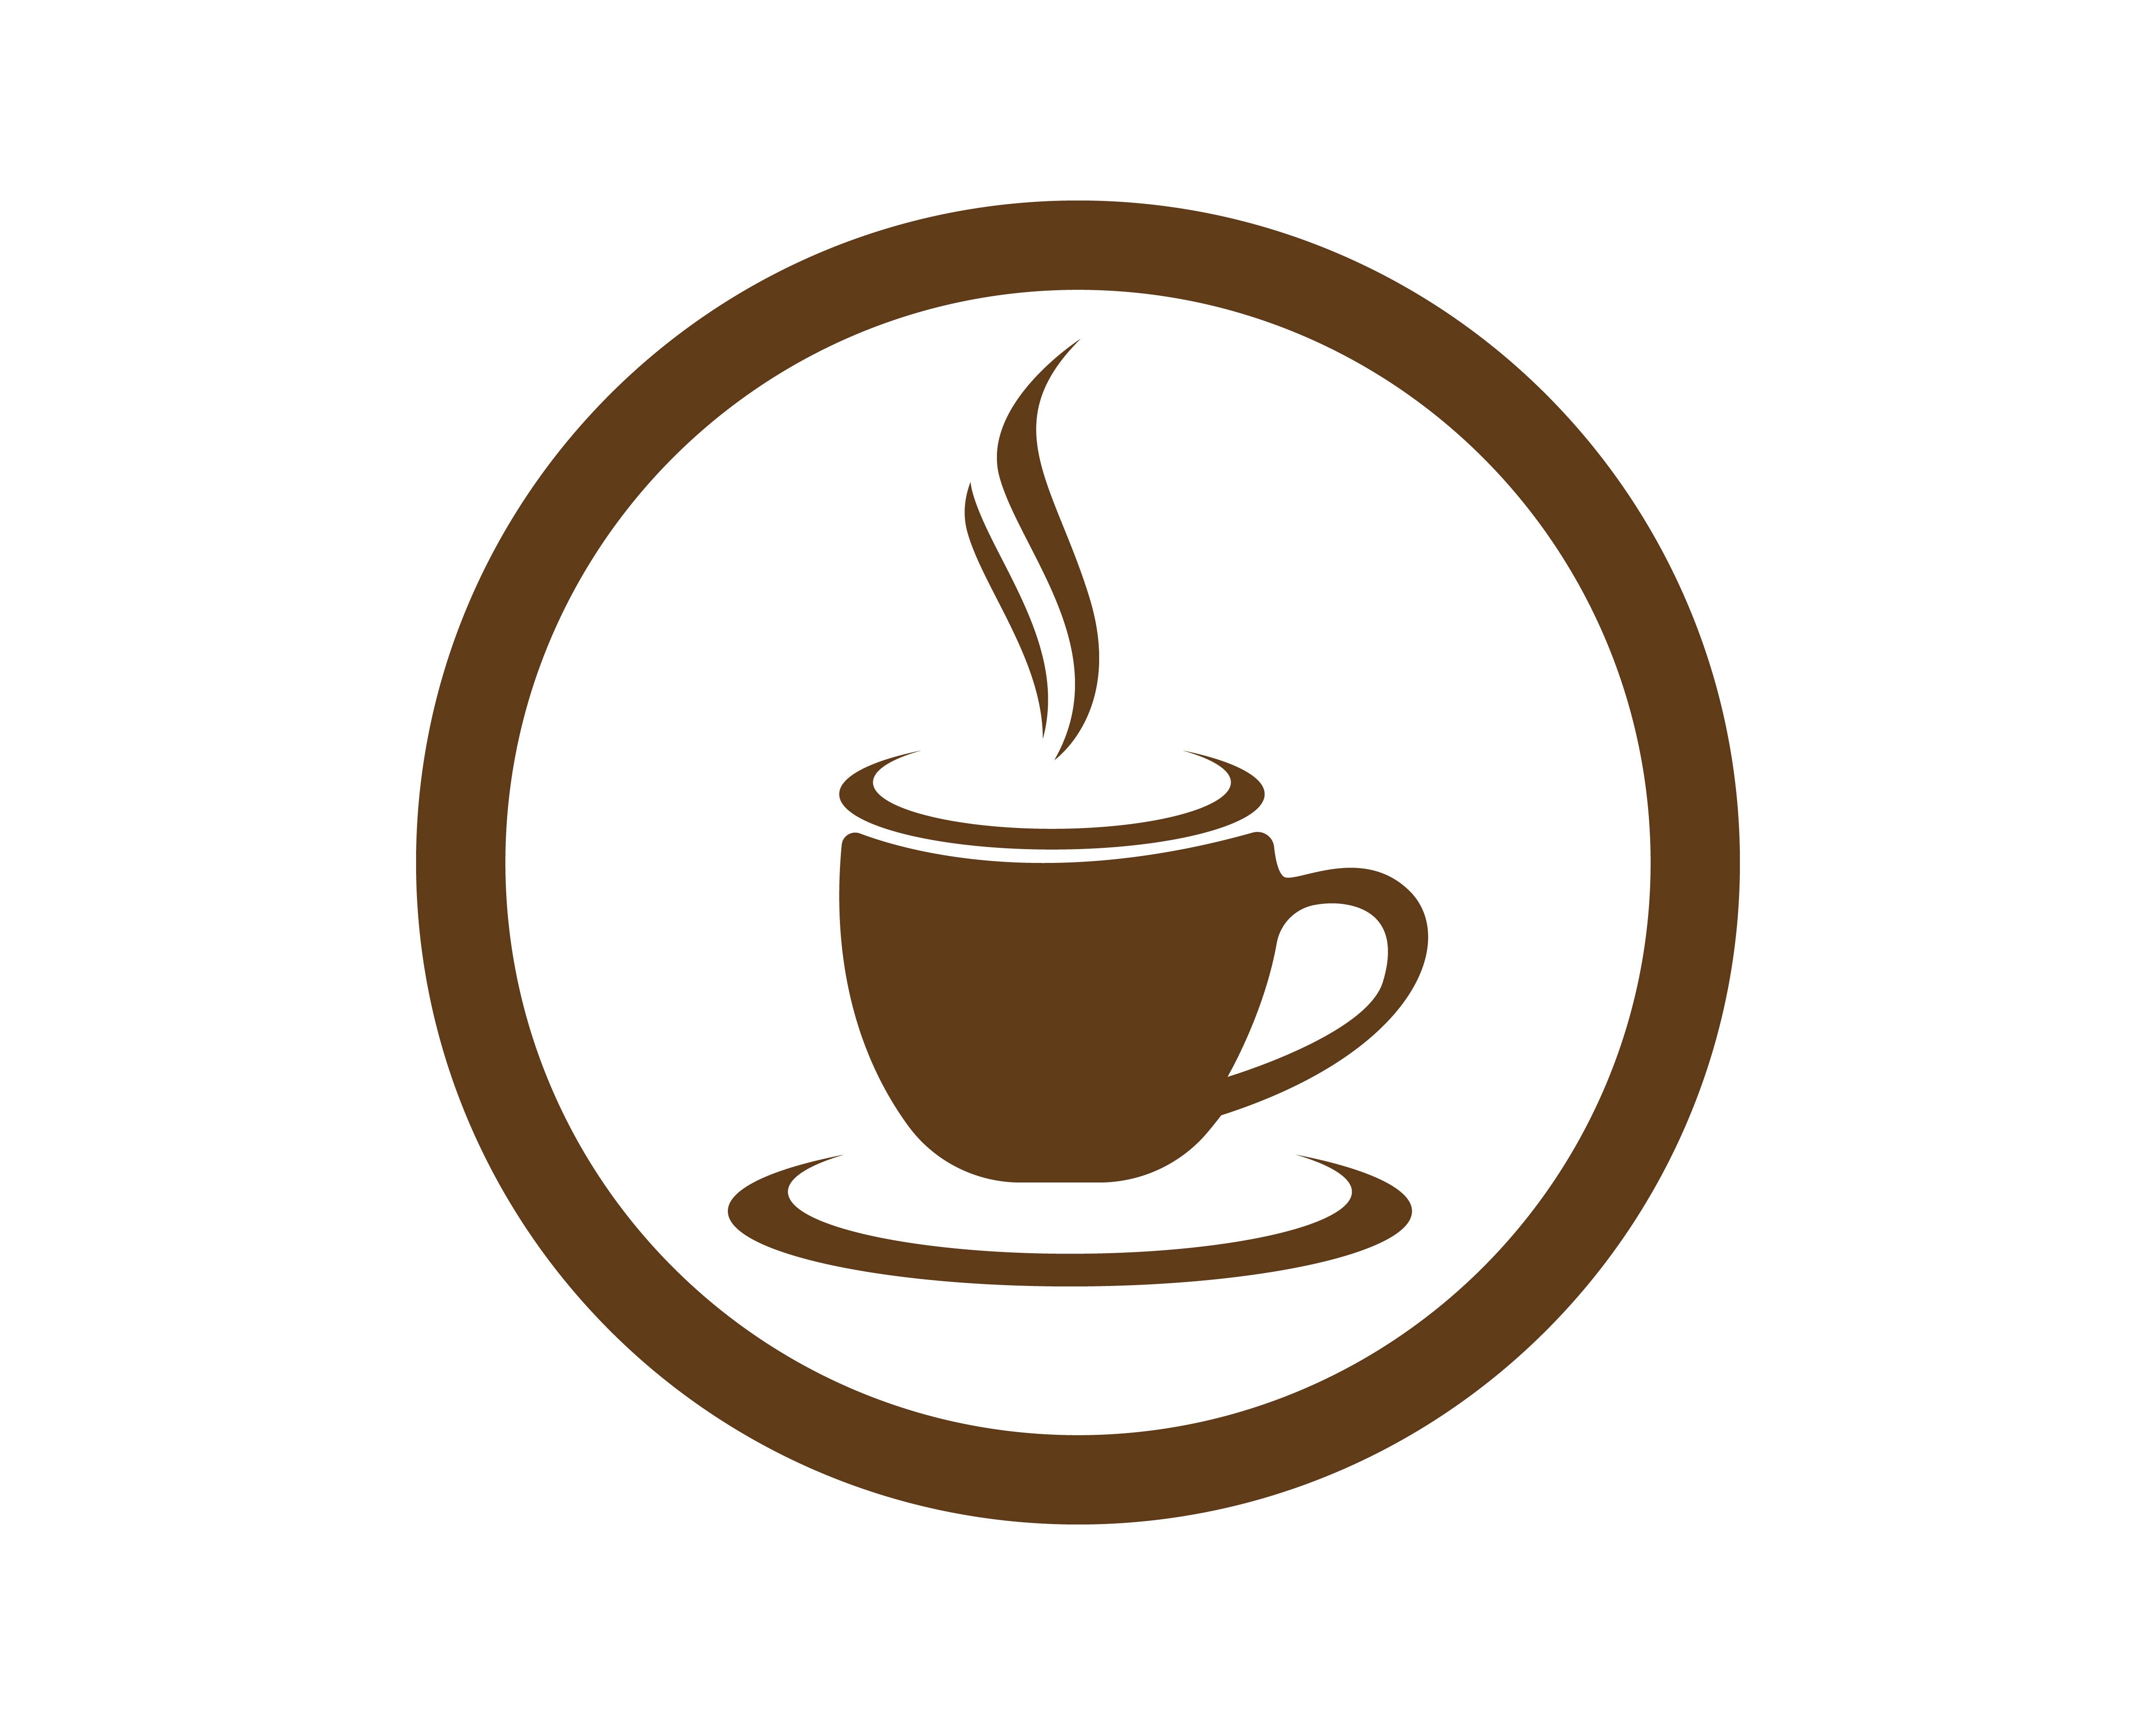 Coffee cup Logo Template vector icon design - Download ...